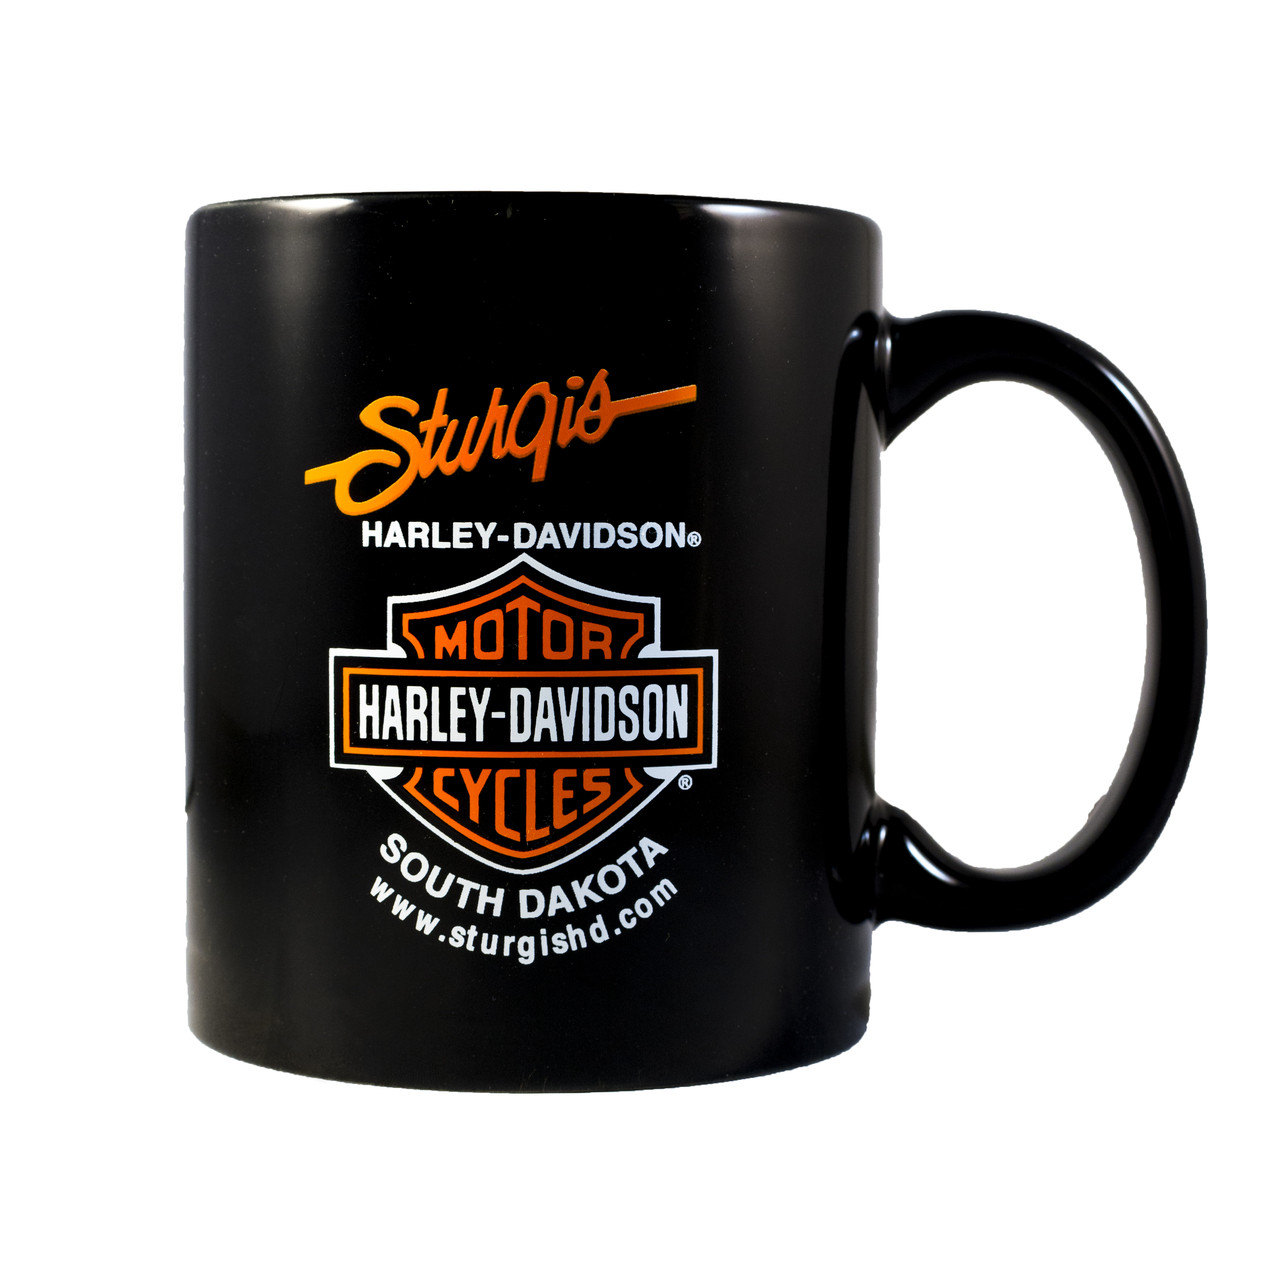 Sturgis Harley-Davidson® Coffee Mug